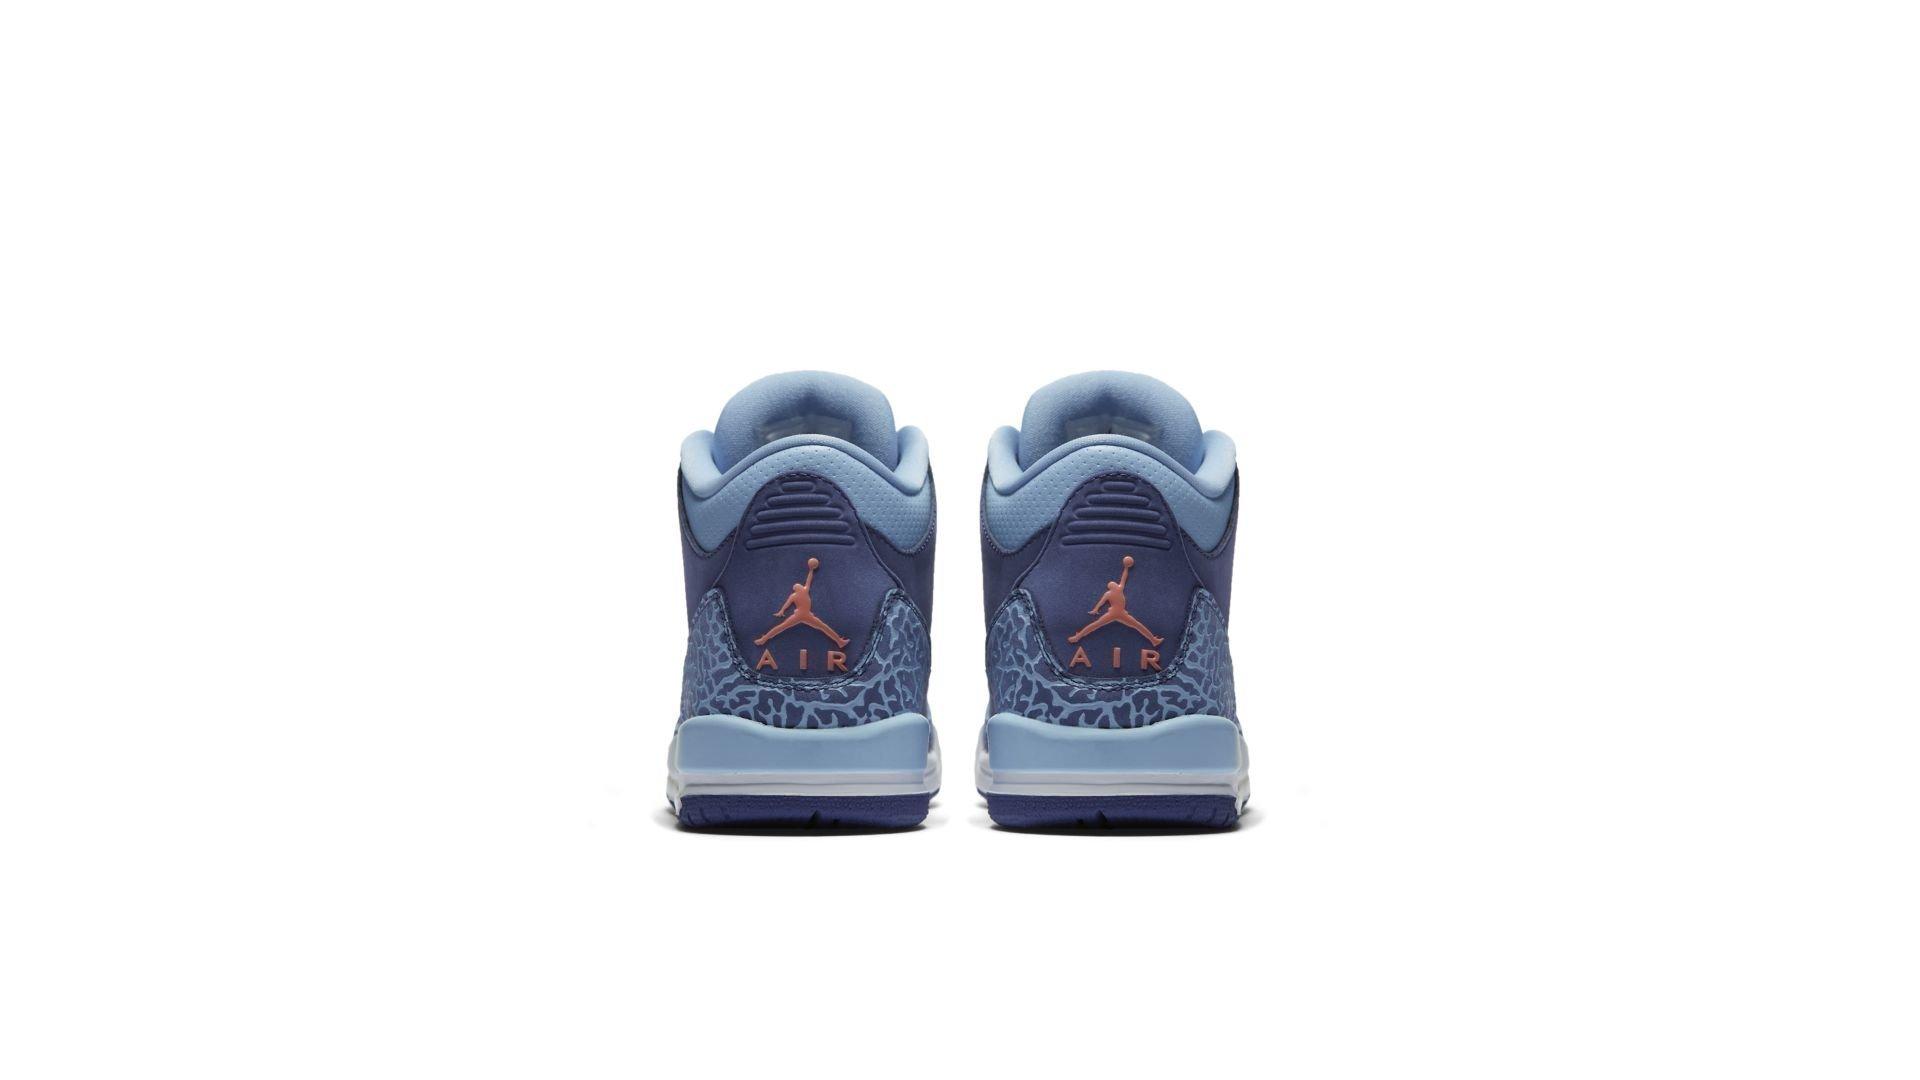 Jordan 3 Retro Purple Dust (GS) (441140-506)